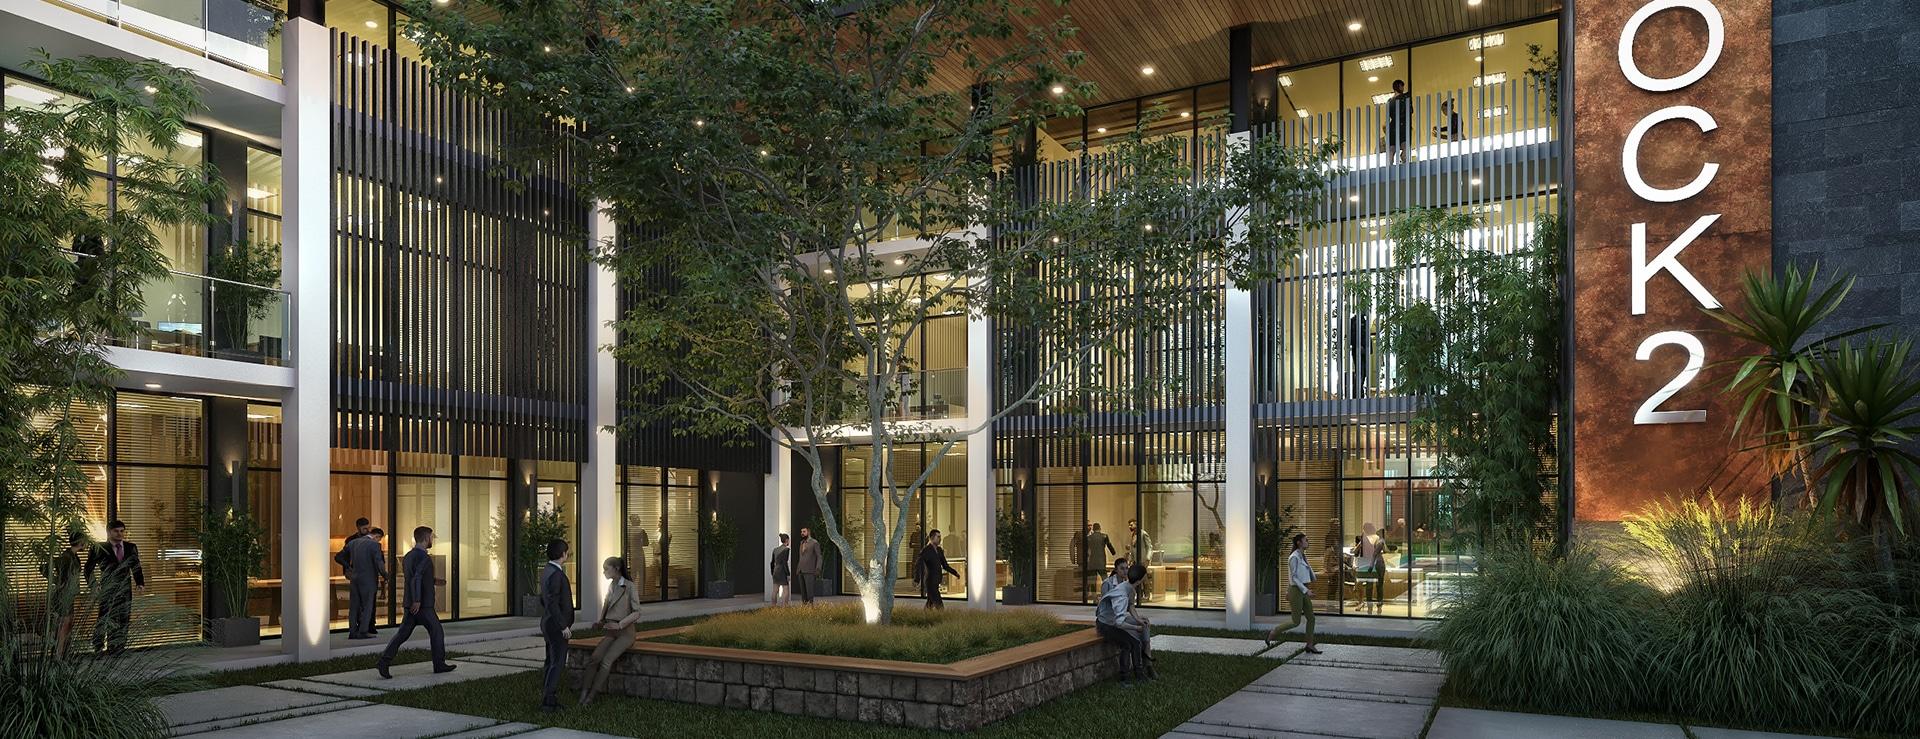 Business District - Beau Plan